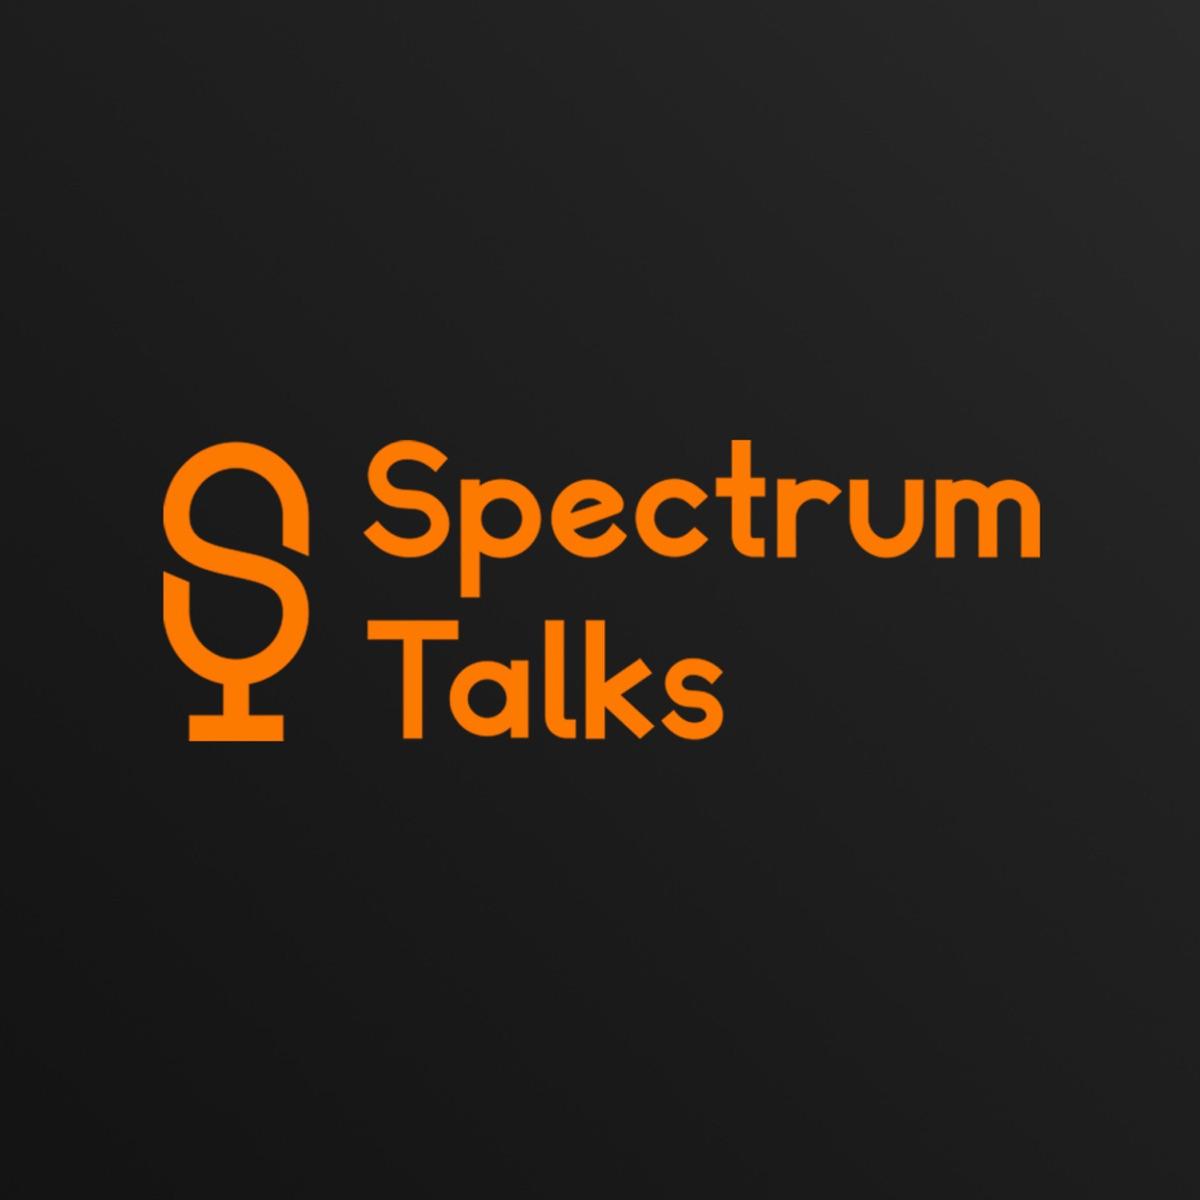 The Spectrum Talks